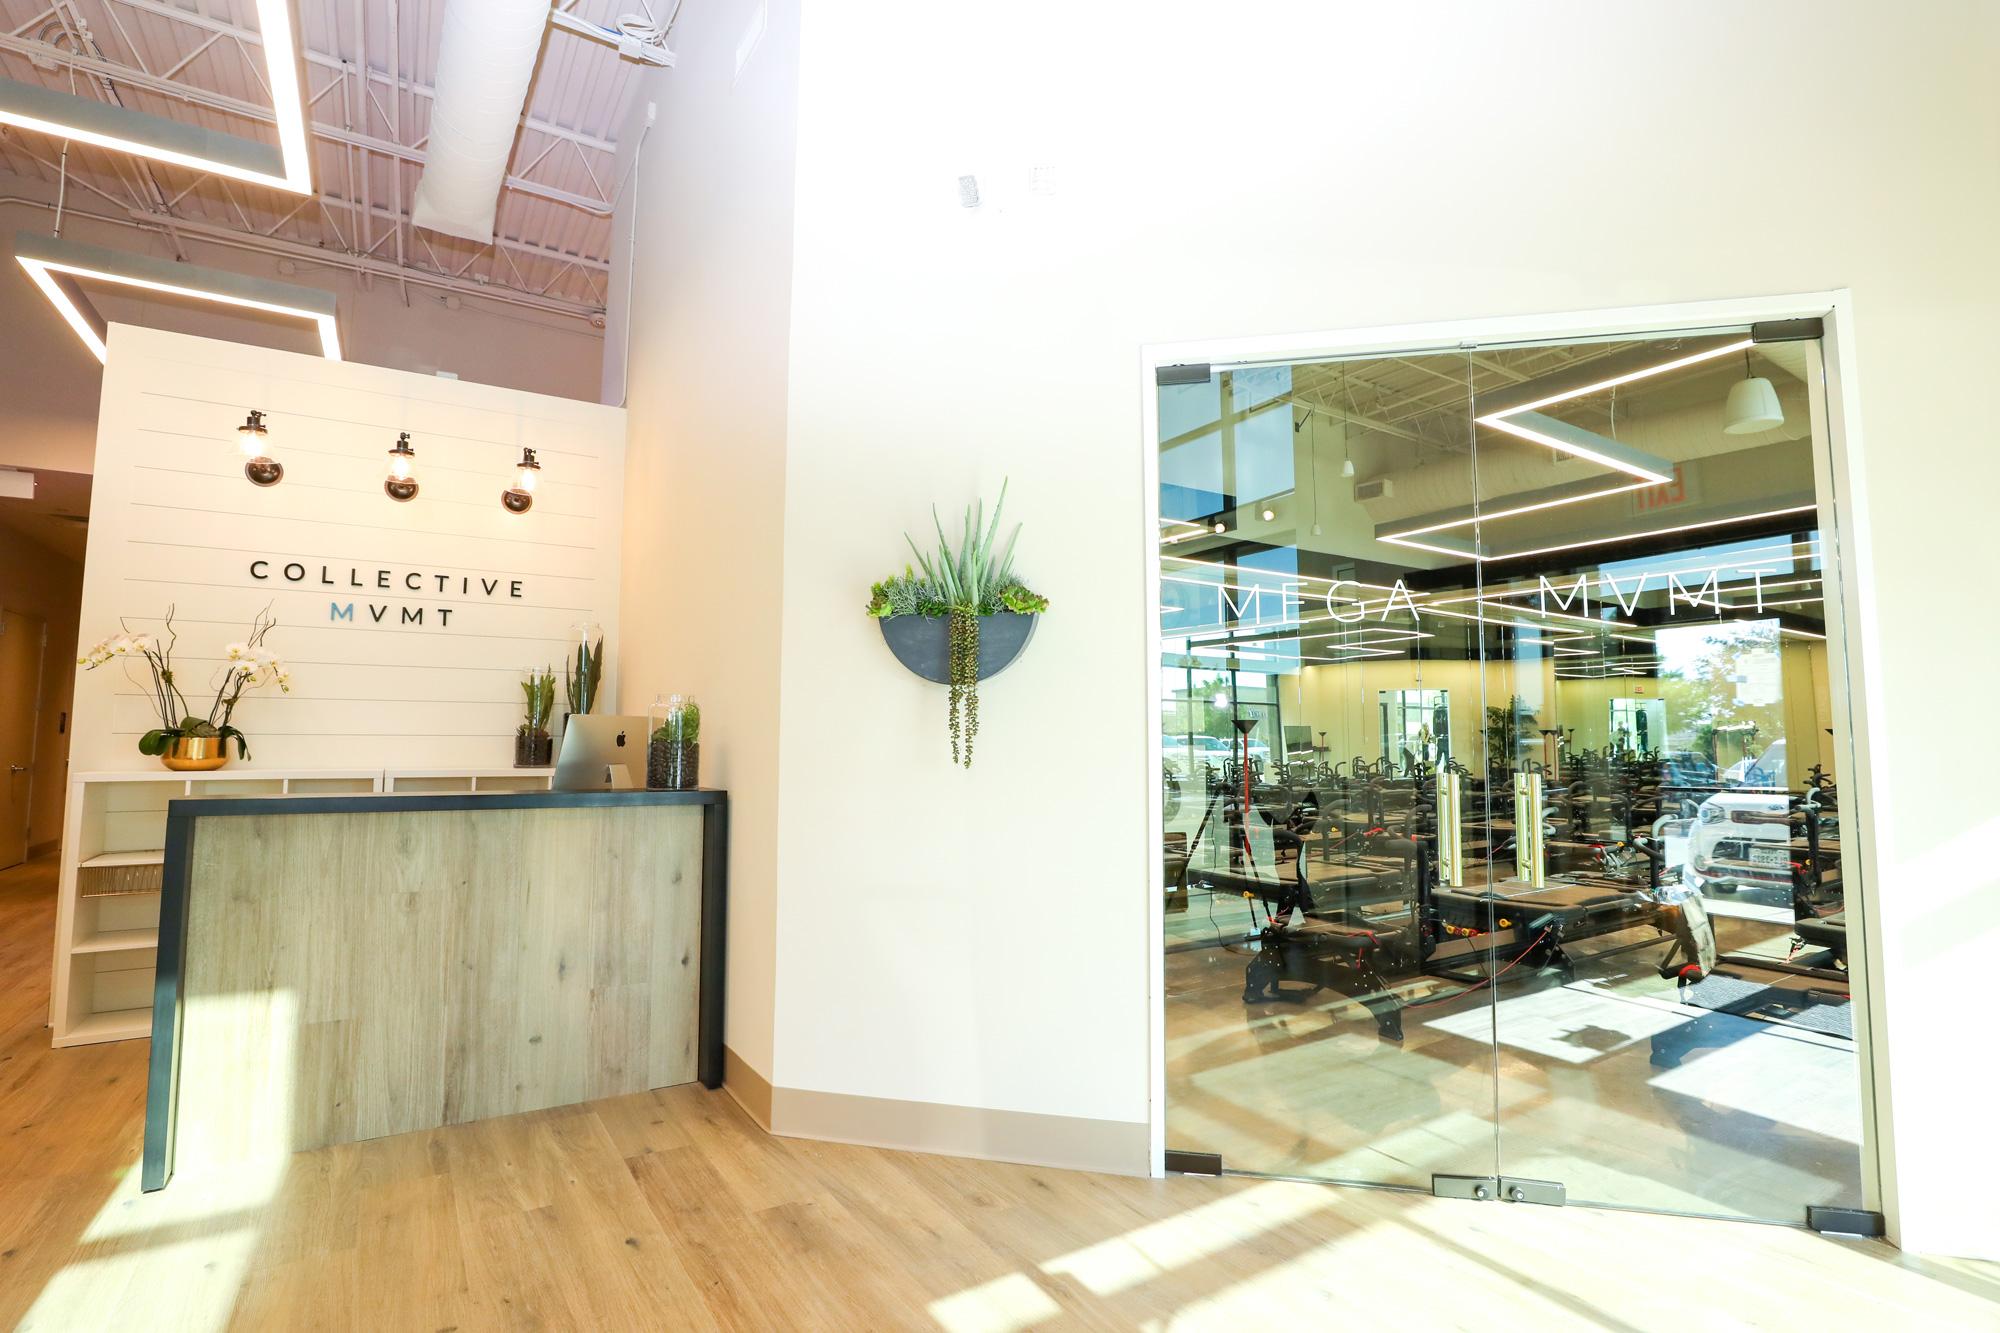 interior of the fitness studio